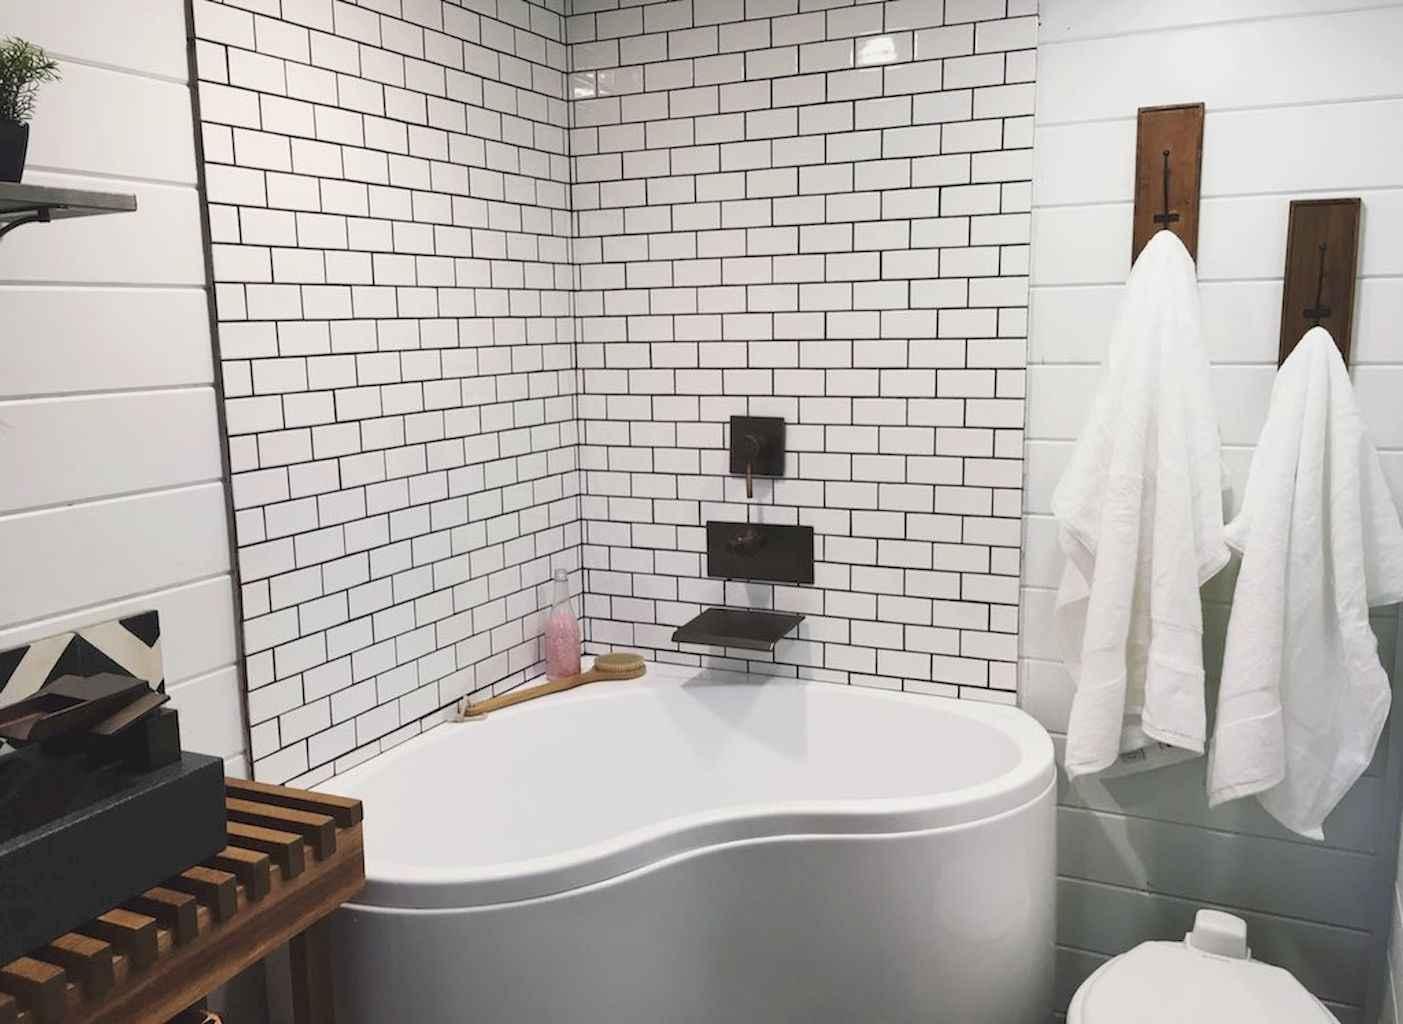 Genius tiny bathroom designs with space saving (45) & 45 Genius Tiny Bathroom Designs with Space Saving - HomeSpecially